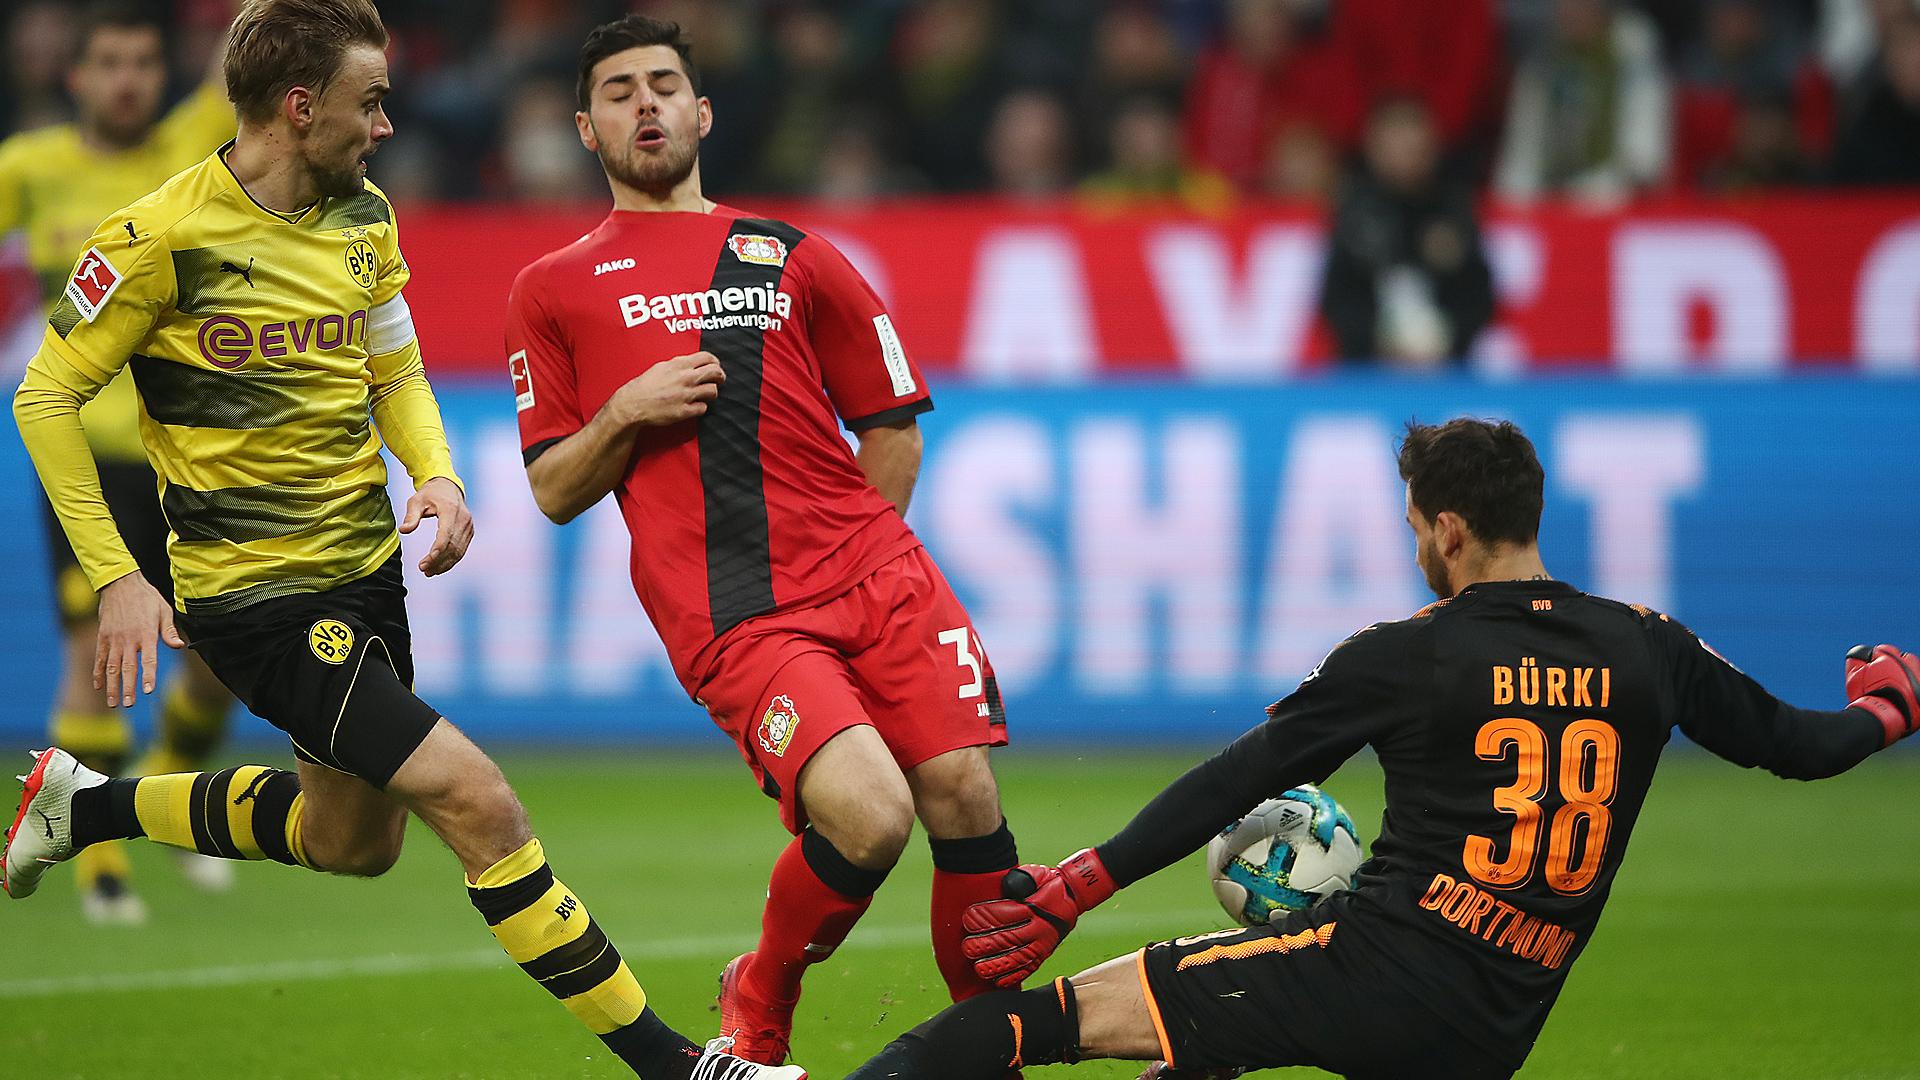 Dortmund Bayer Leverkusen